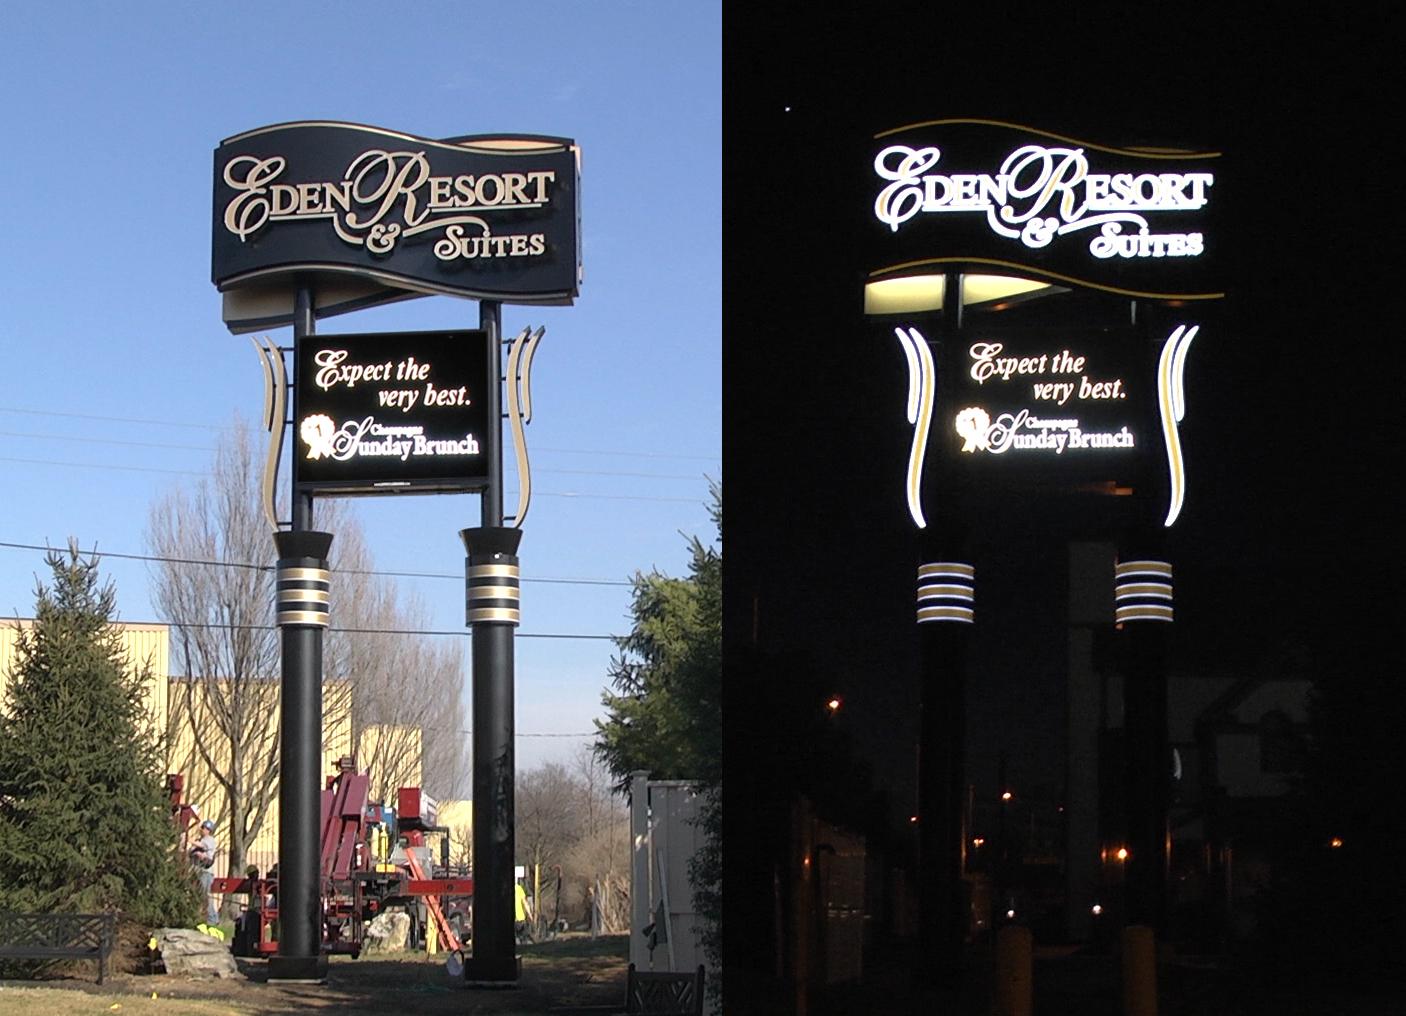 Eden Resort_Day_Night - Pylon w Digital Sign